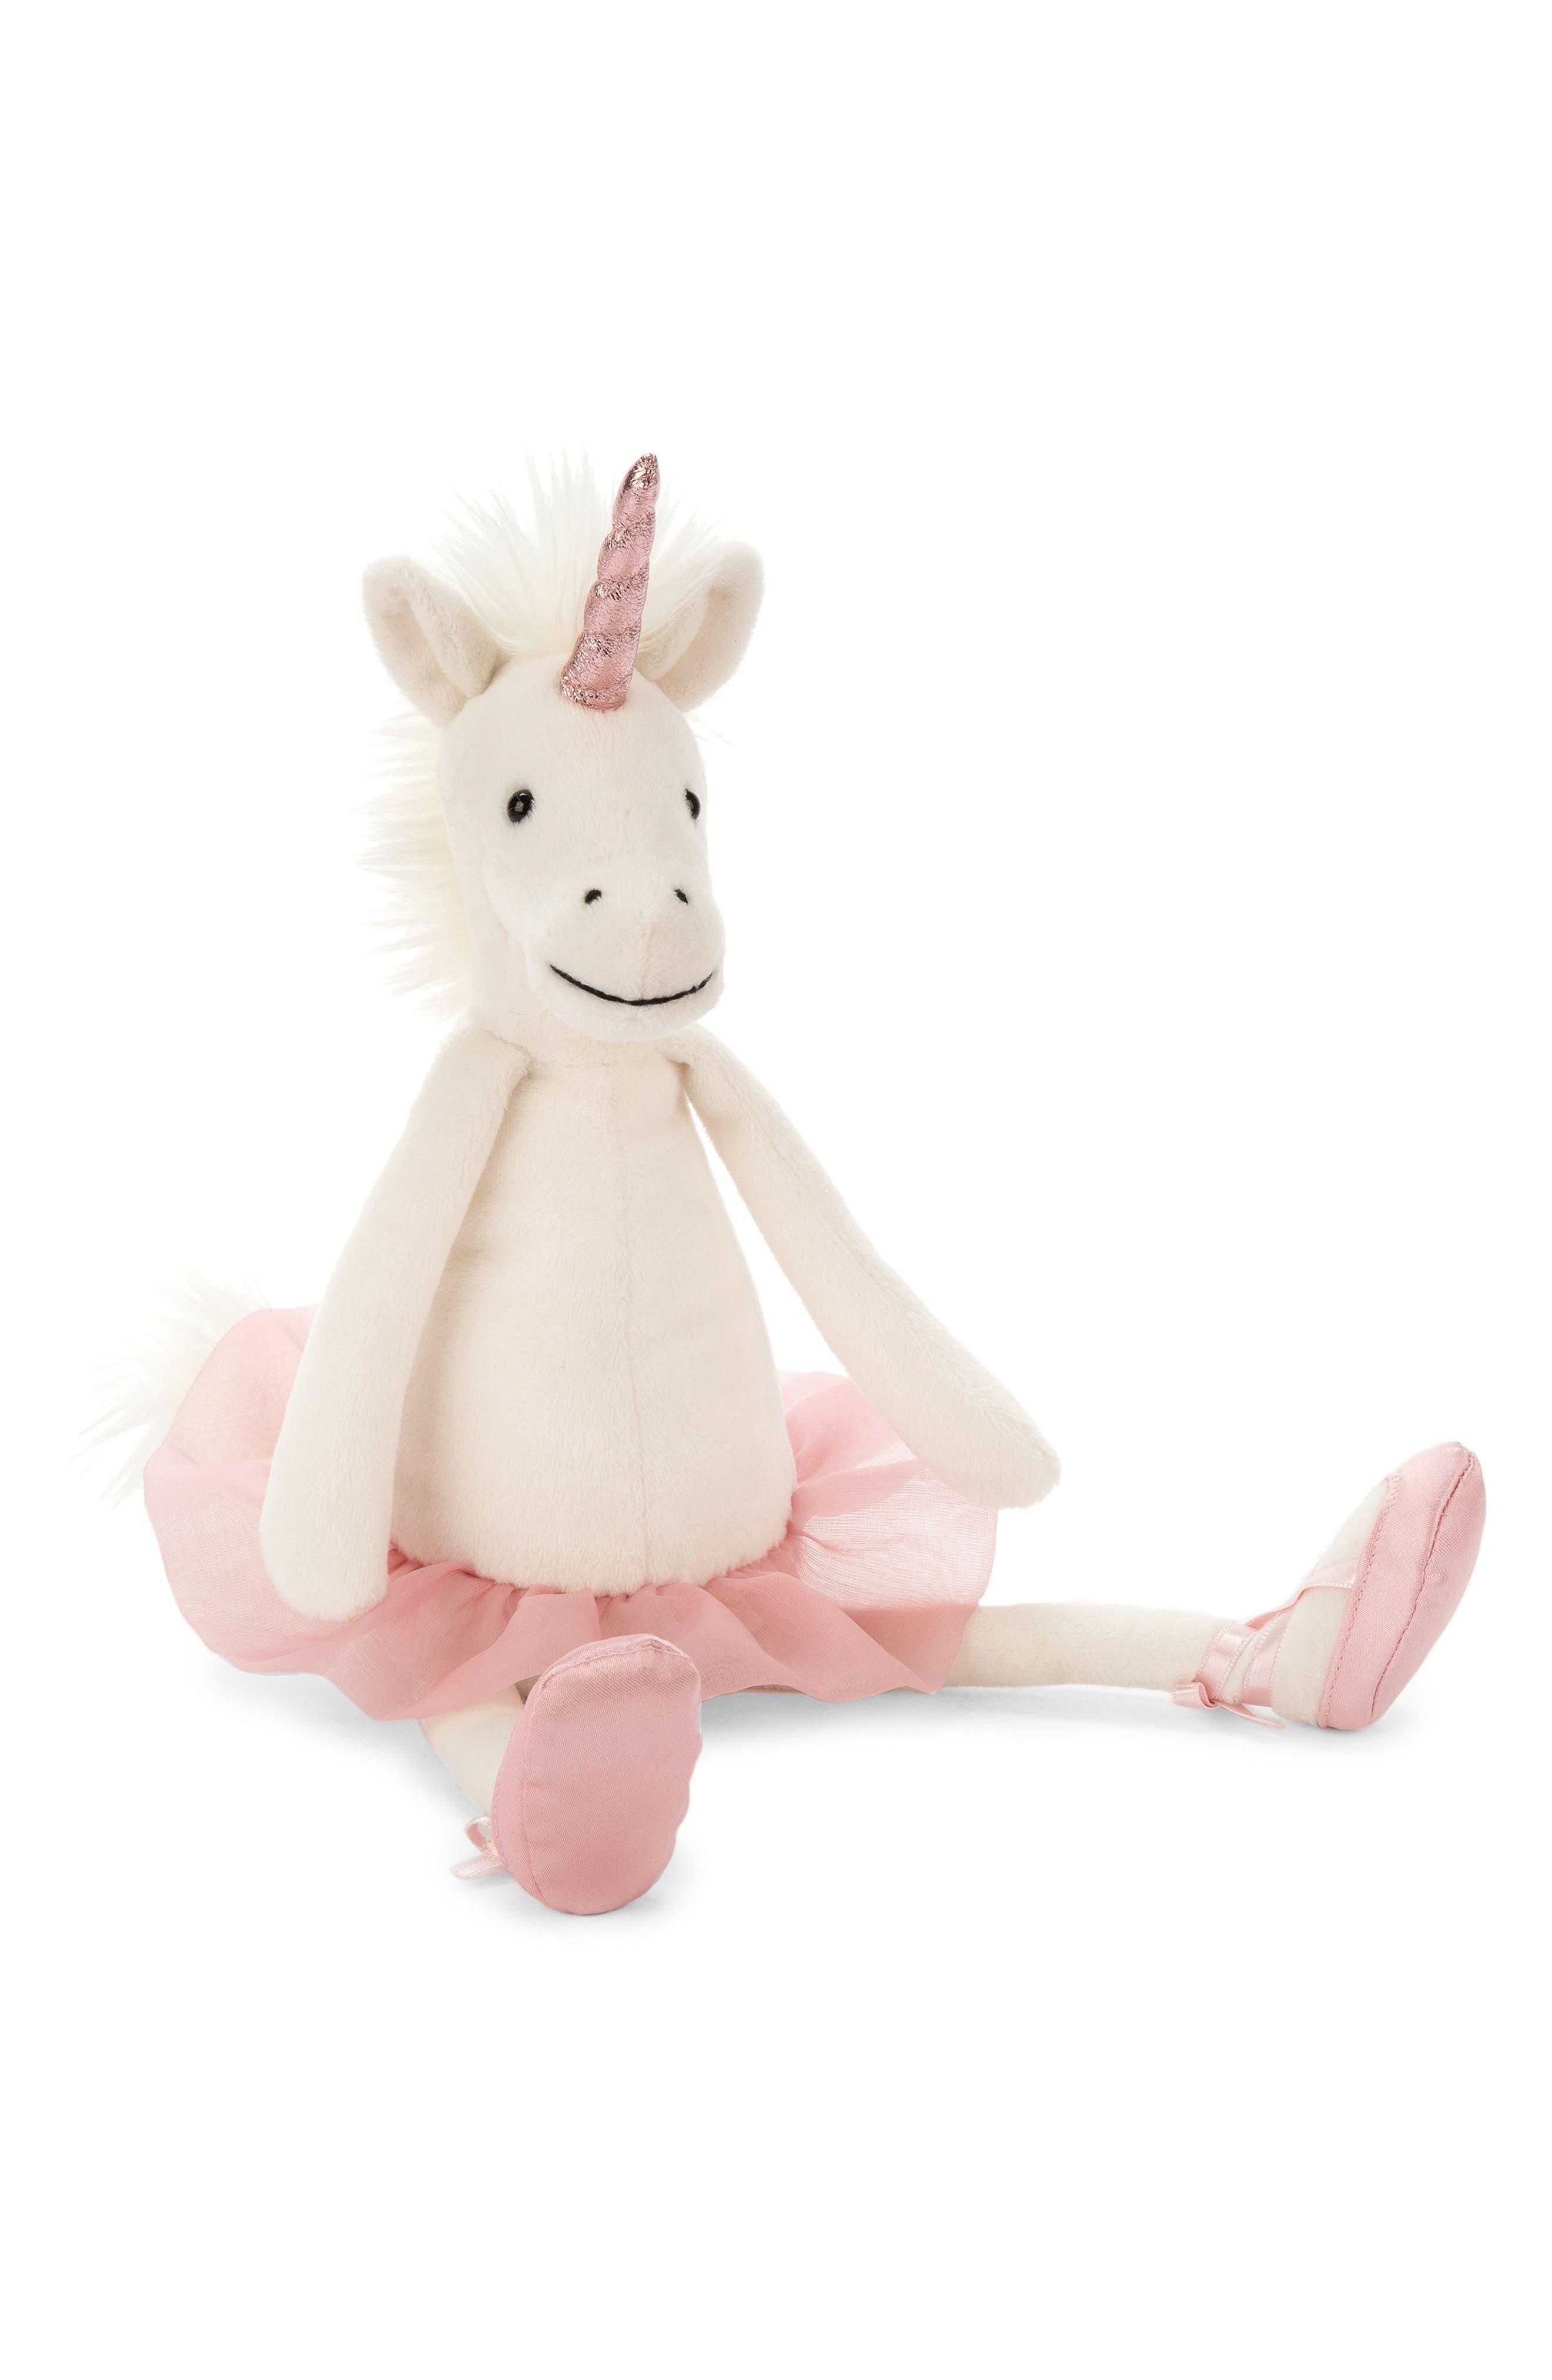 Dancing Darcy Unicorn Stuffed Animal,                         Main,                         color, CREAM / PINK